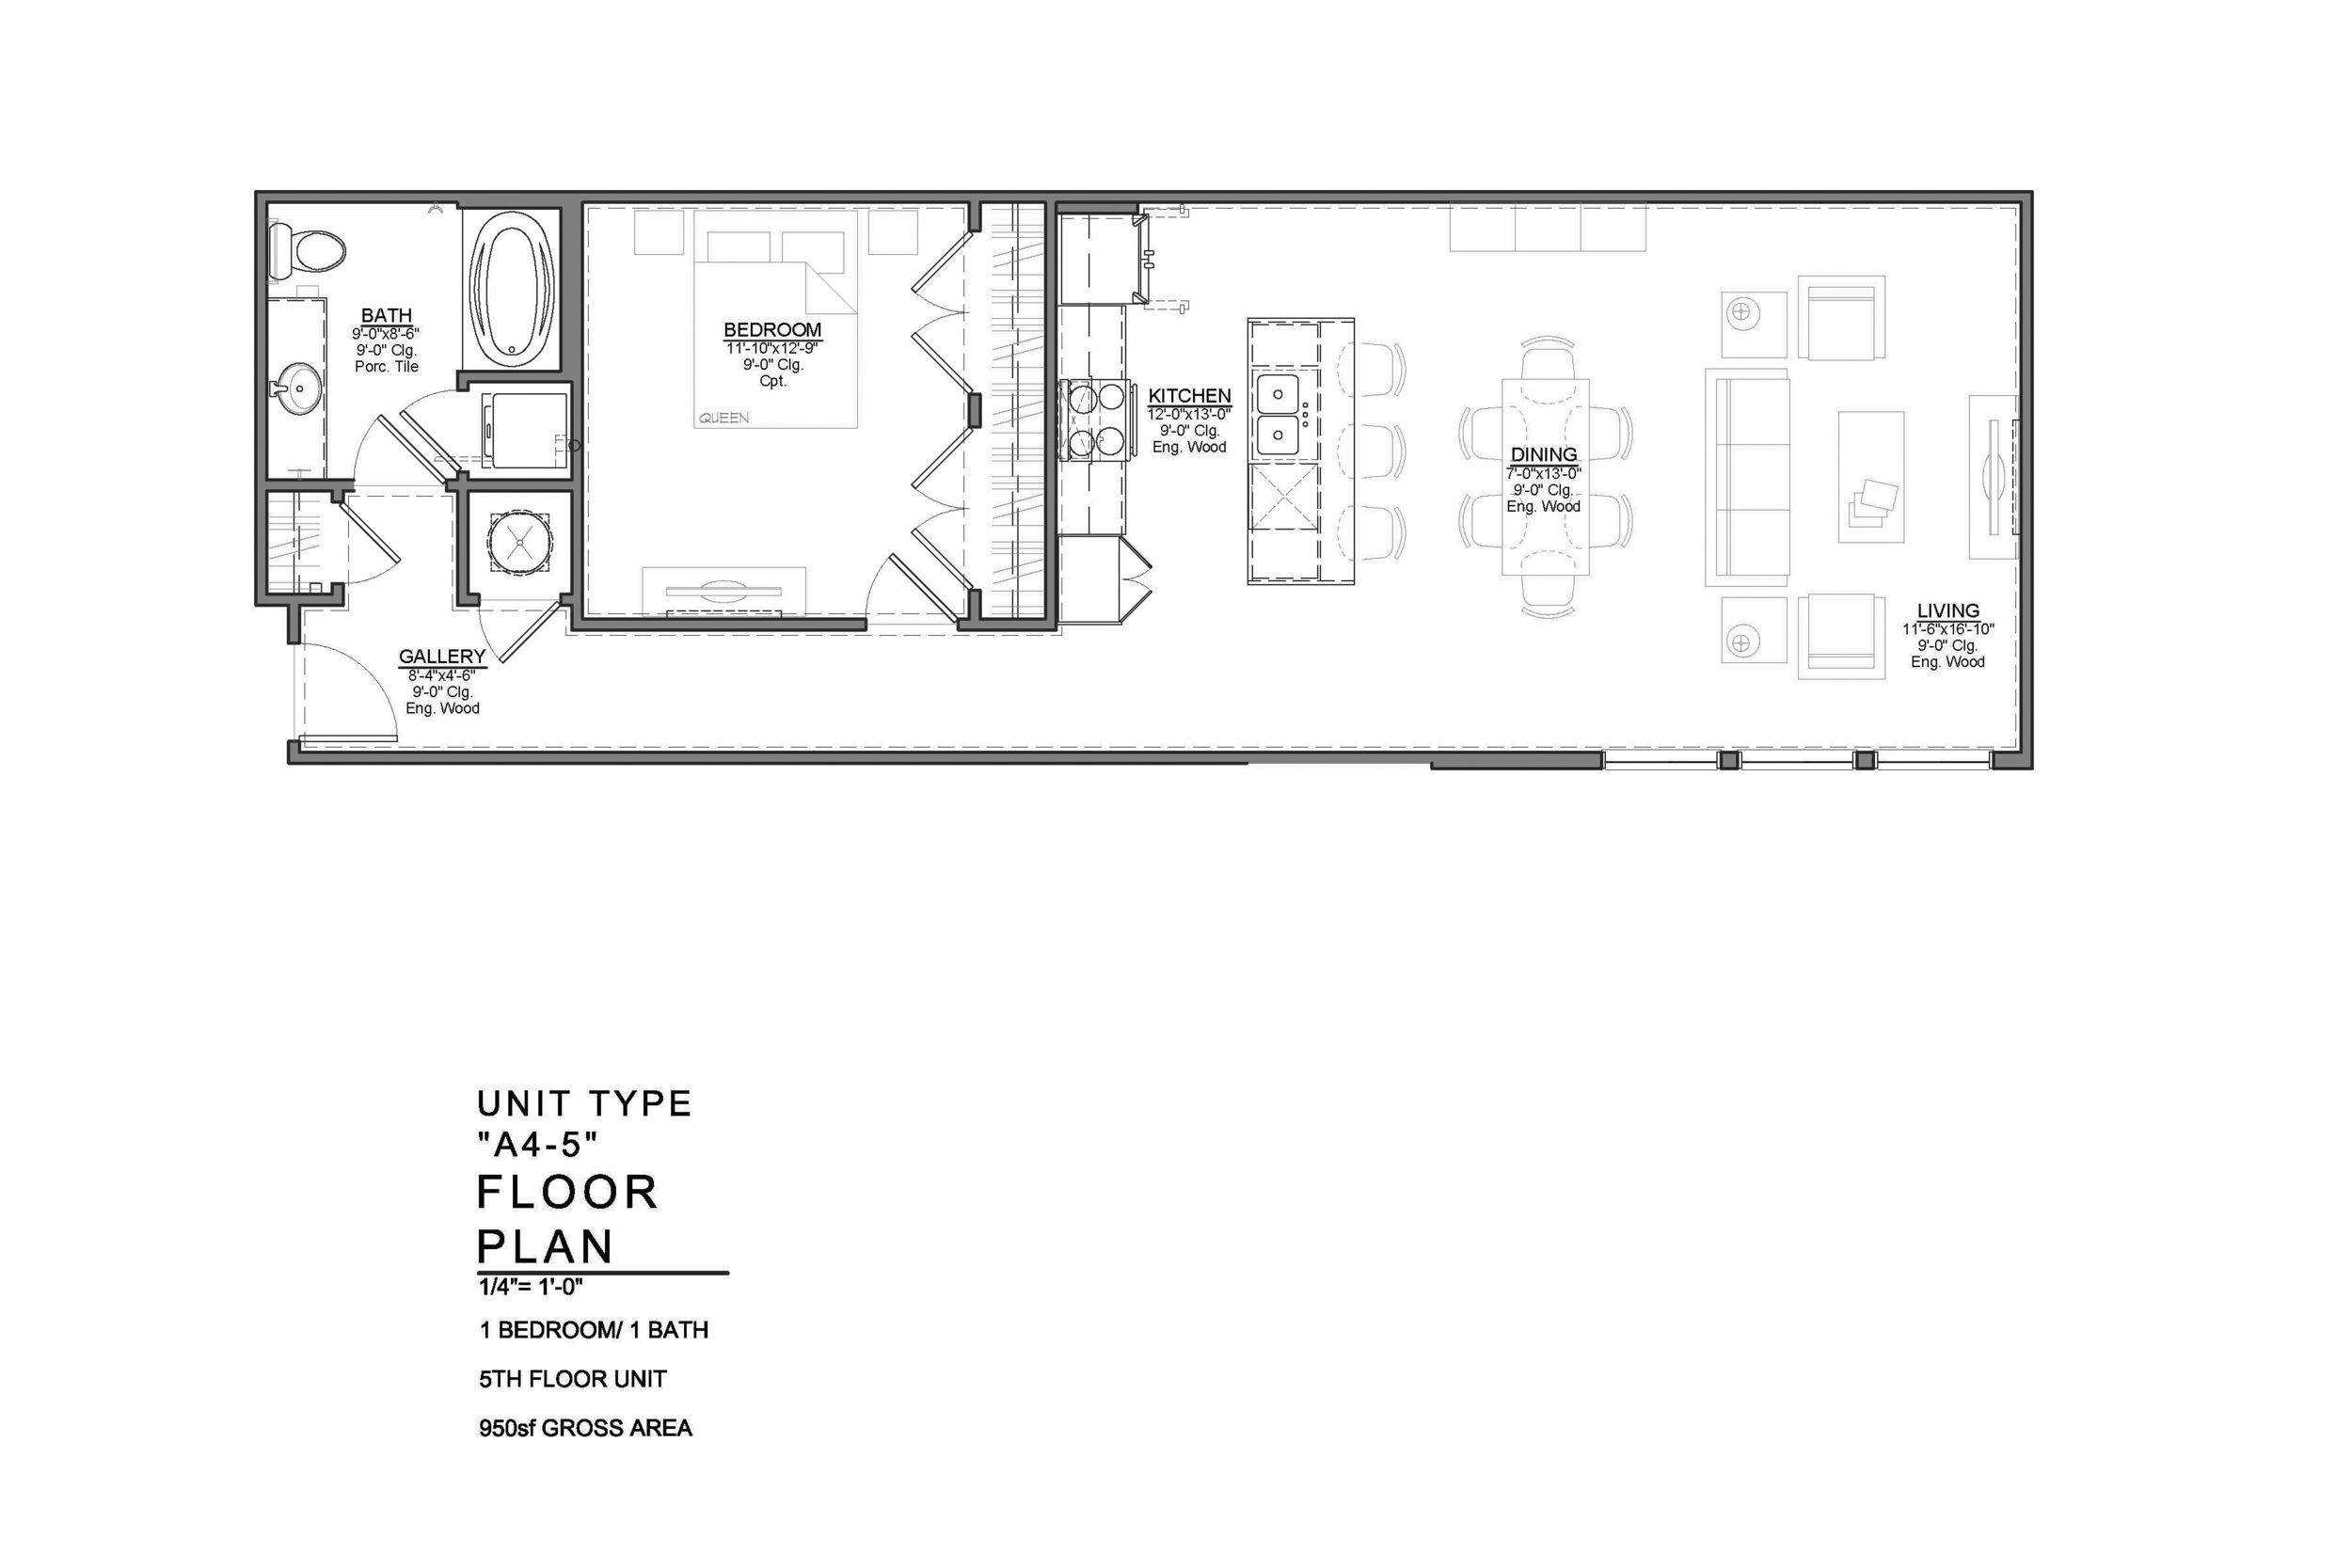 A4-5: 1 BEDROOM / 1 BATH